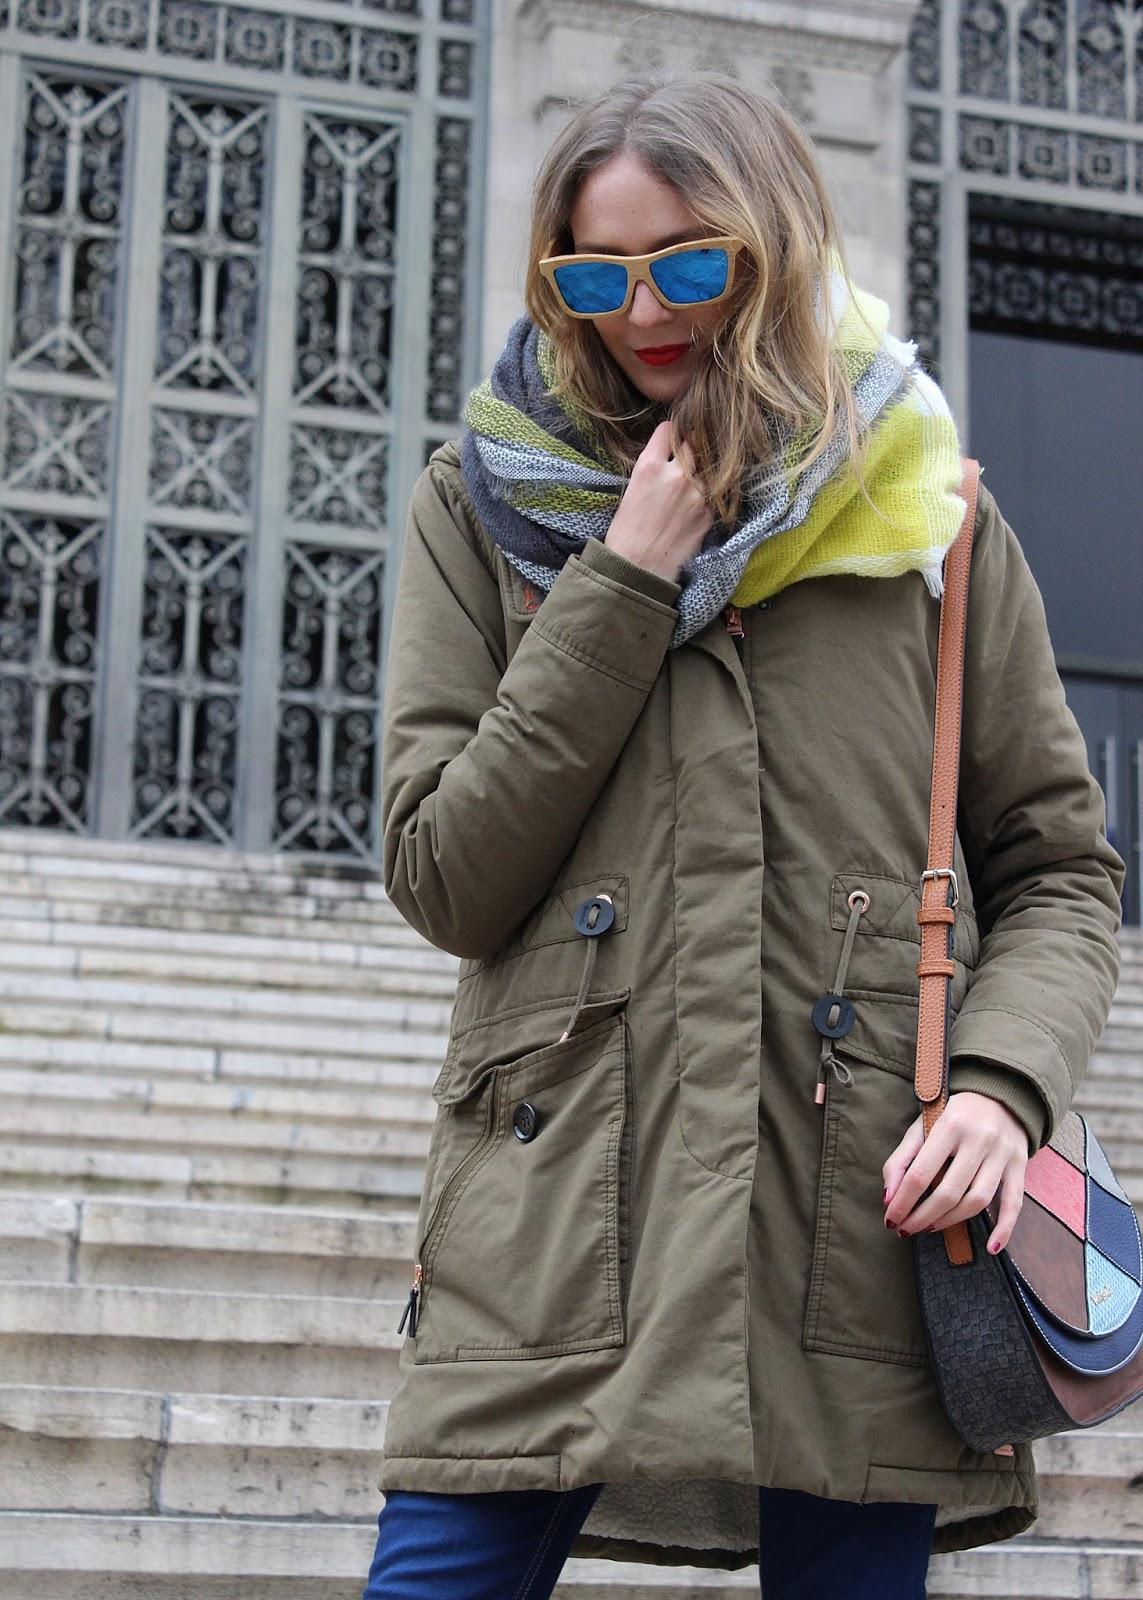 spanish sunglasses